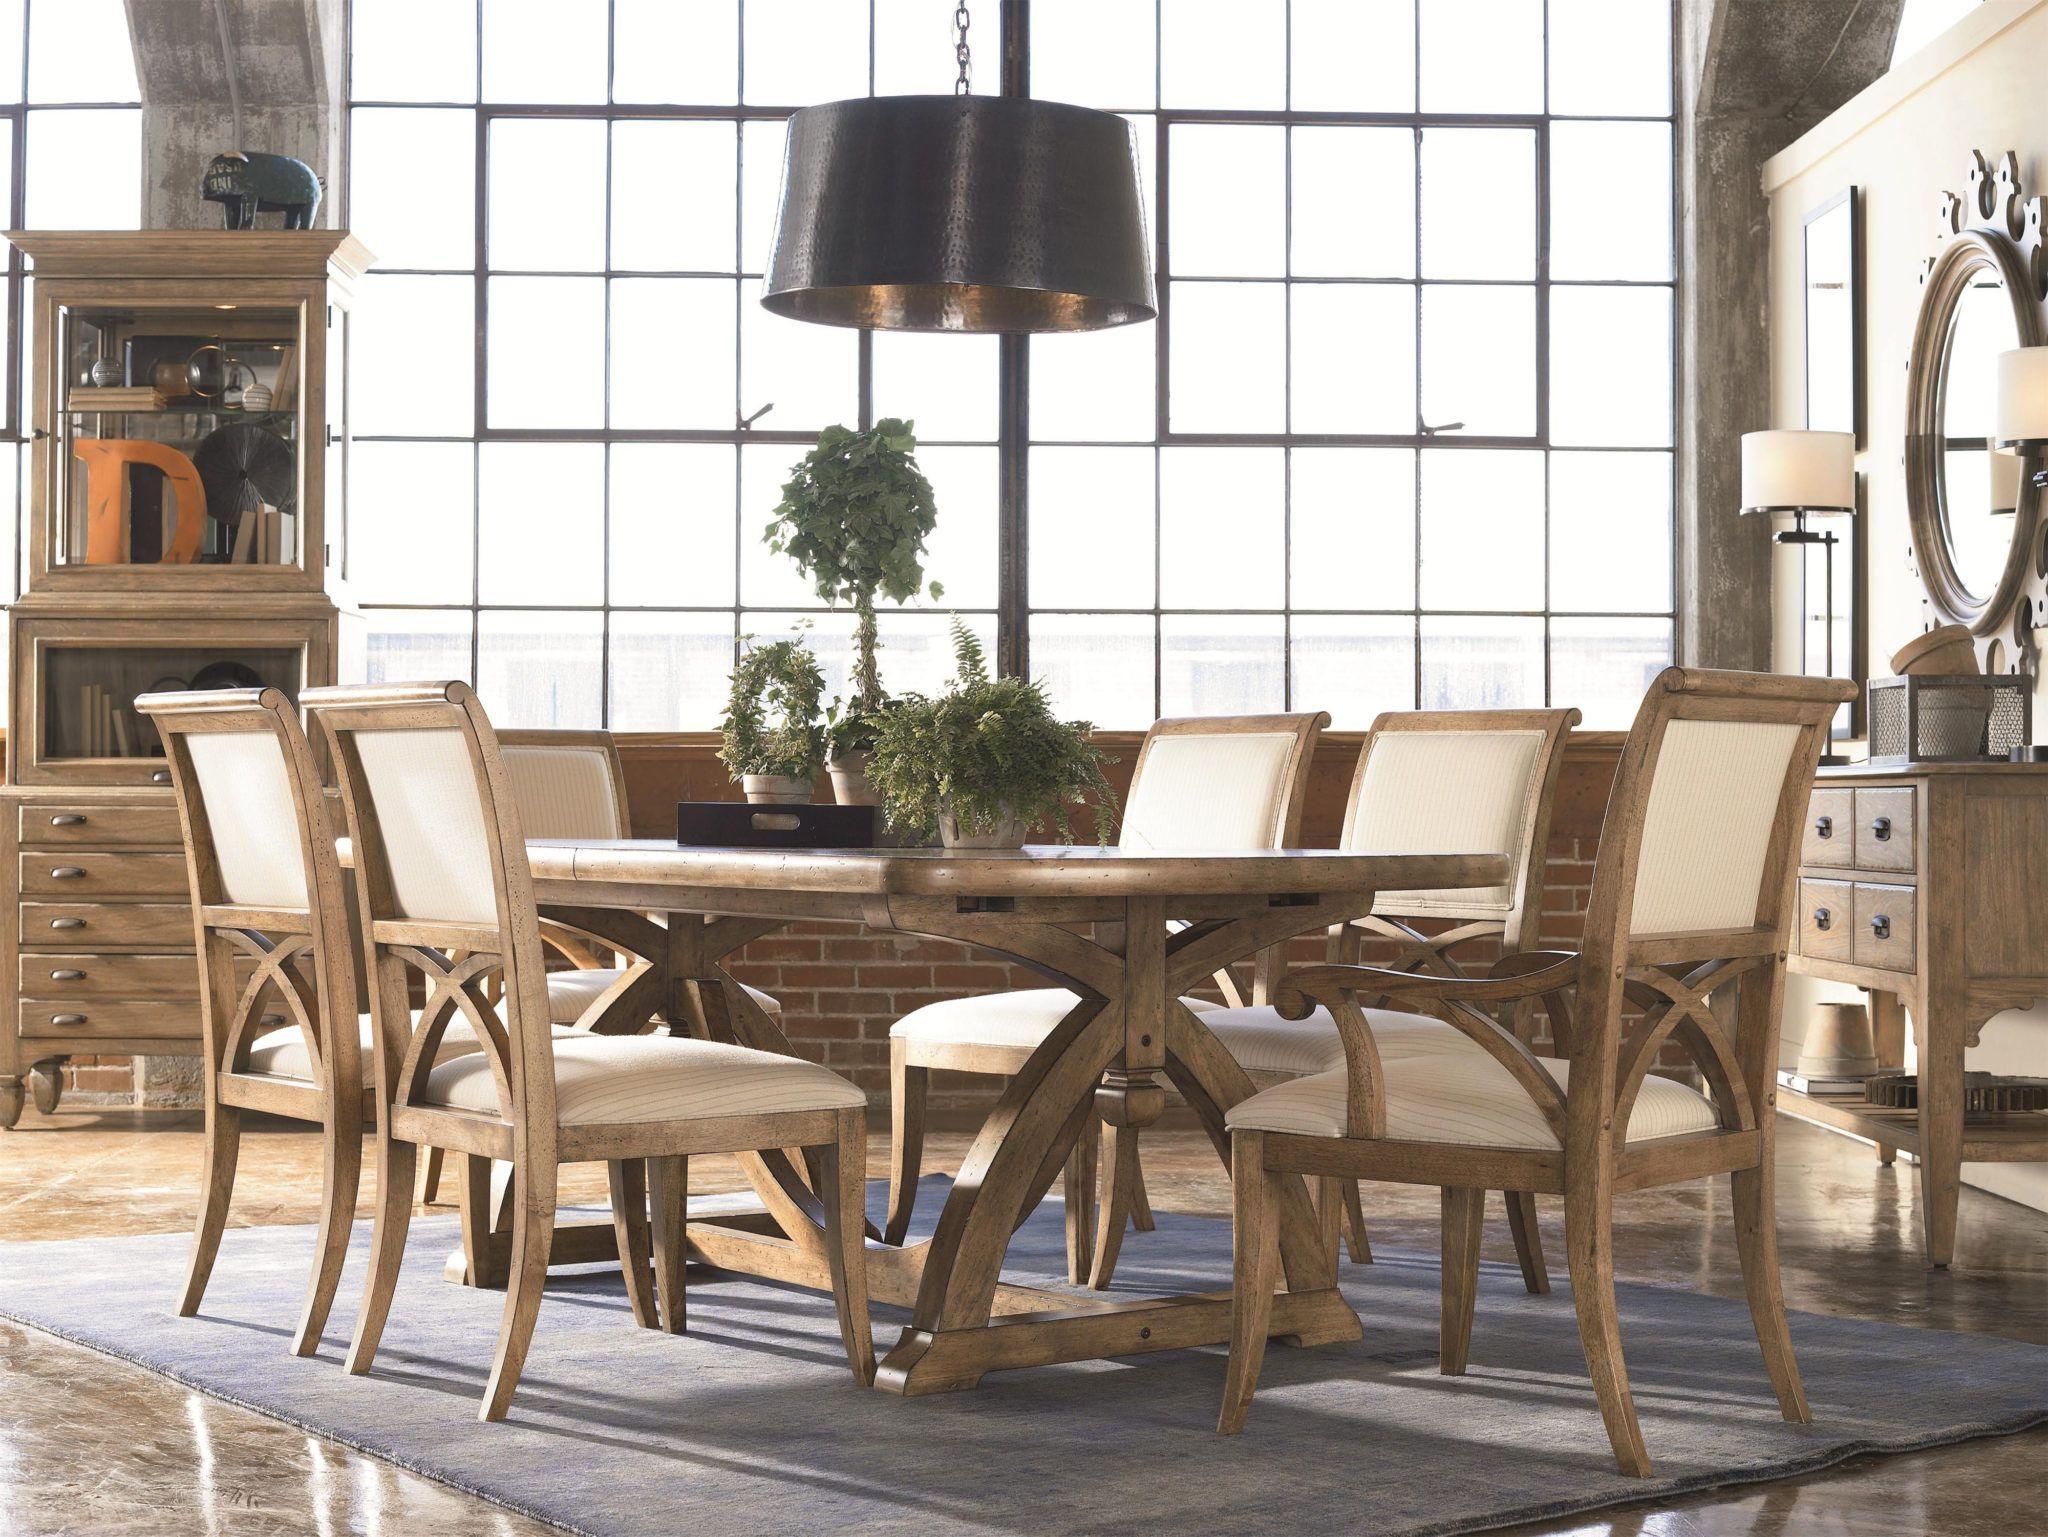 excellent thomasville kitchen table kitchentable trestle dining rh pinterest com